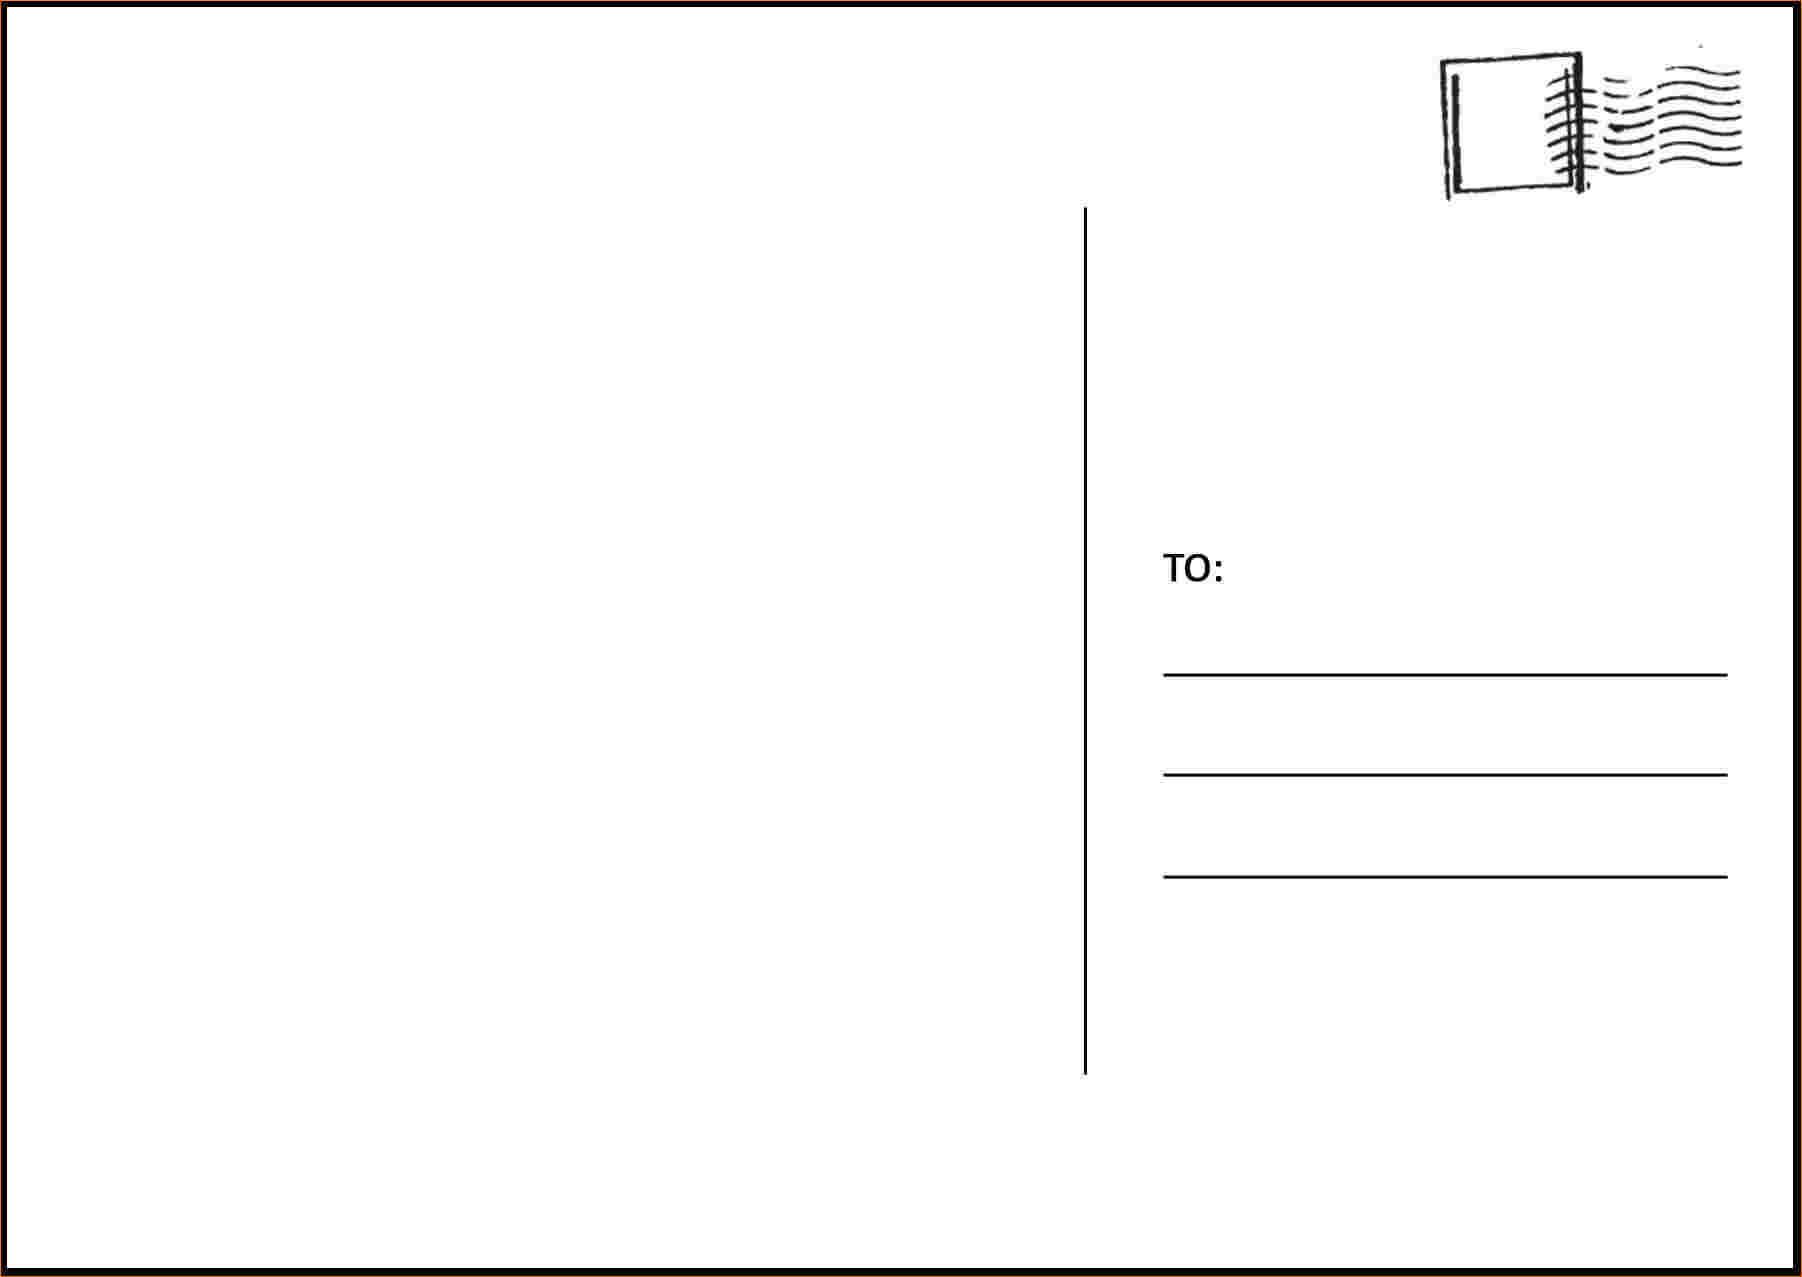 Postcard Template Microsoft Word - Tunu.redmini.co Regarding Microsoft Word 4X6 Postcard Template